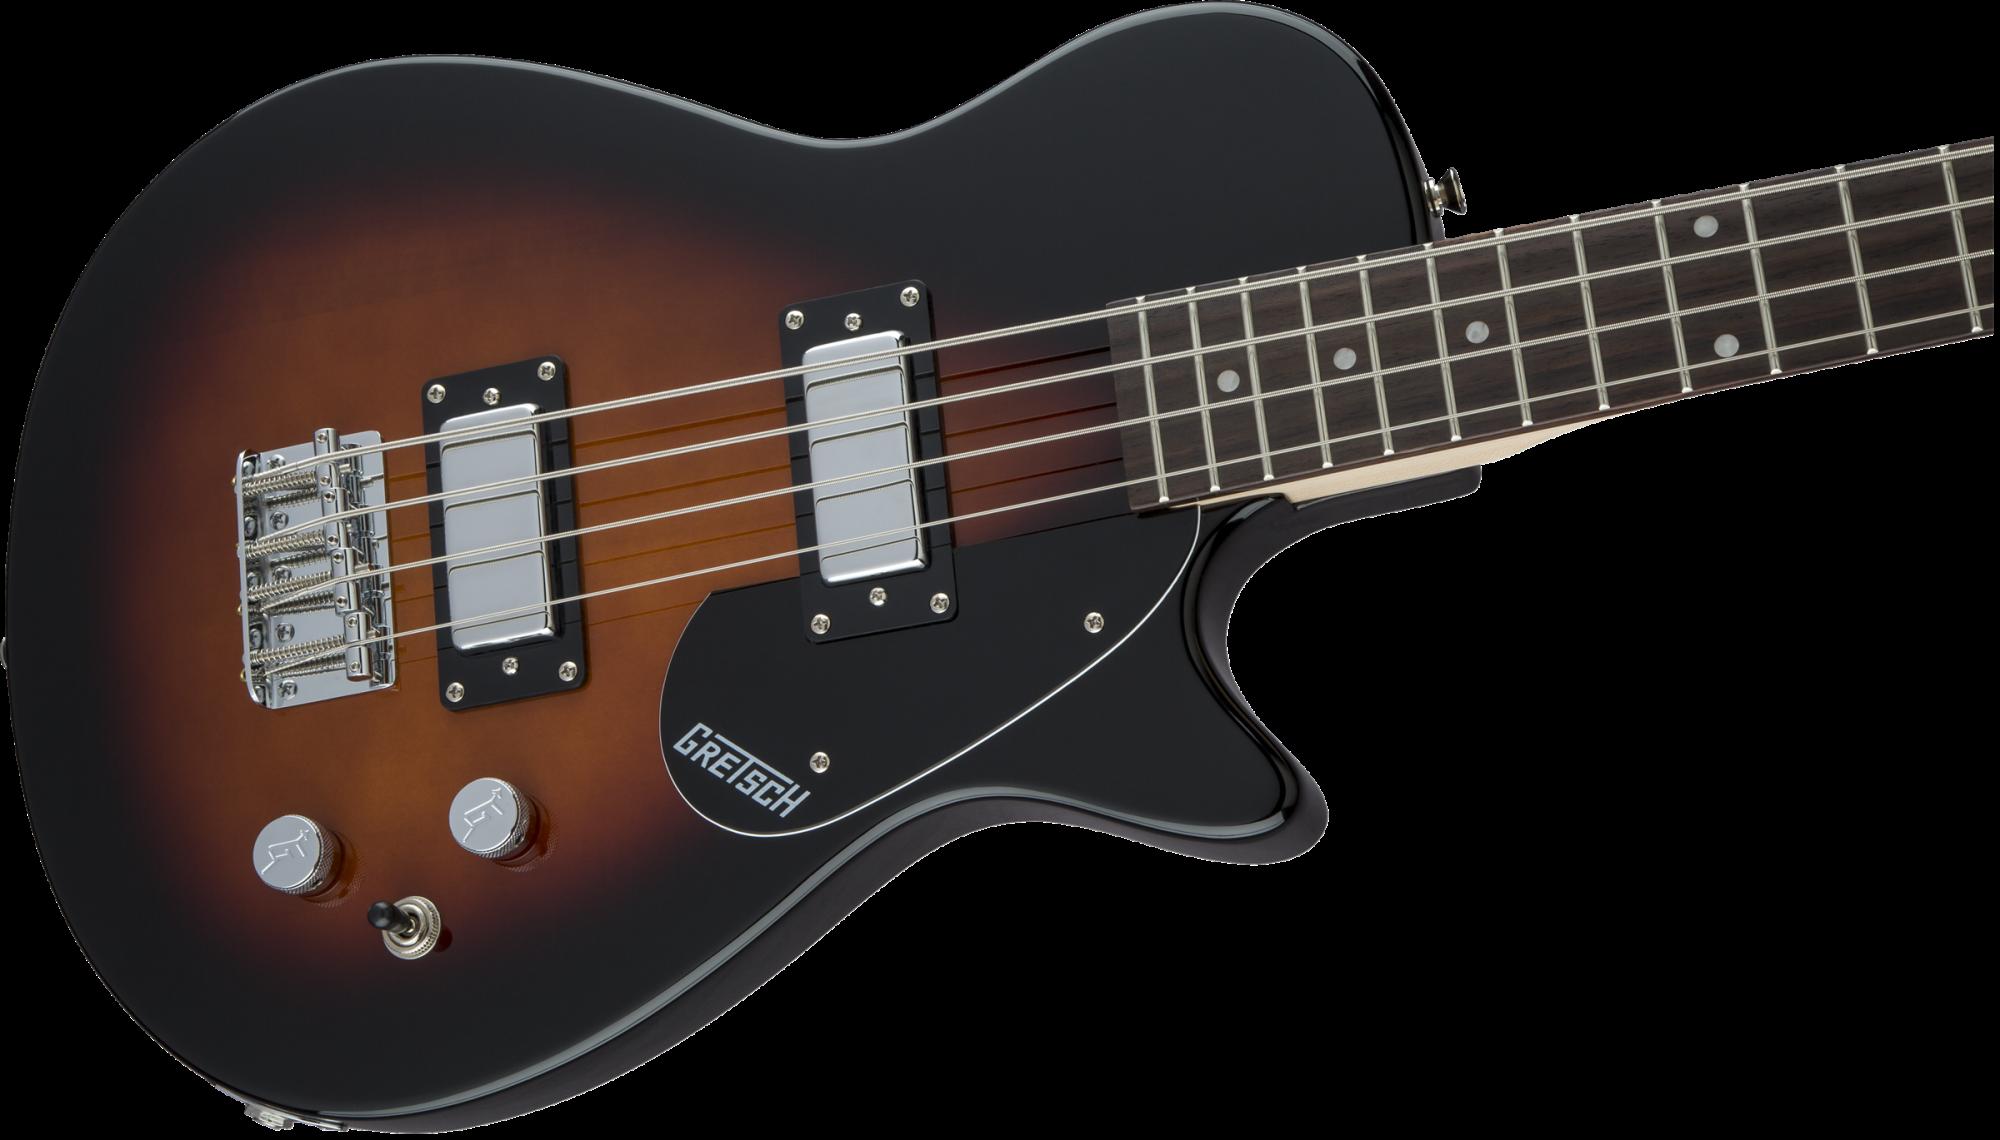 Gretsch G2220 Electromatic Junior Jet Bass II Short-Scale, Tobacco Sunburst